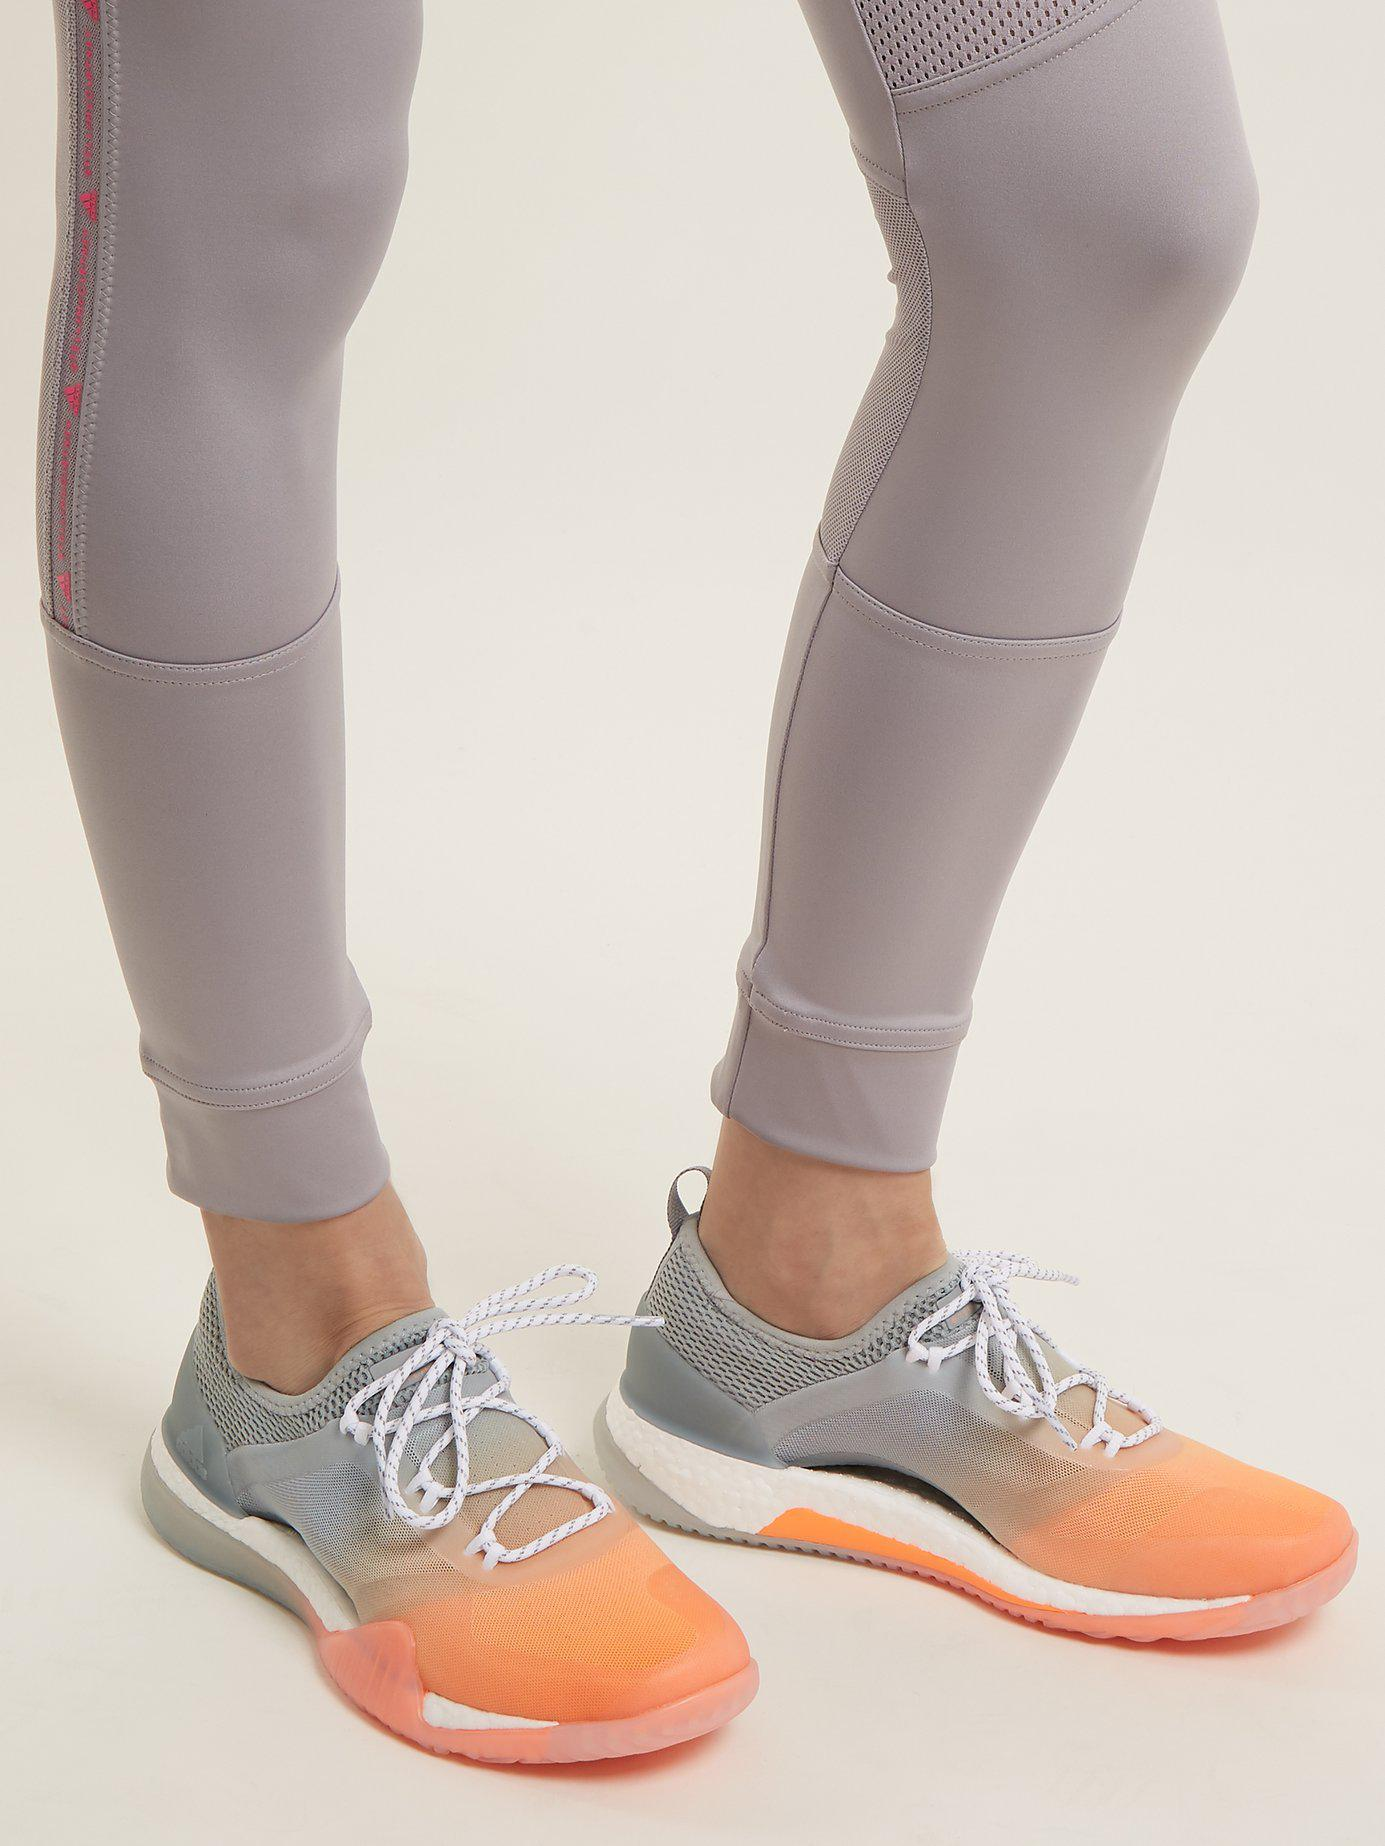 571516c091470 adidas By Stella McCartney Pureboost Tr3.0 Contrast-panel Trainers ...